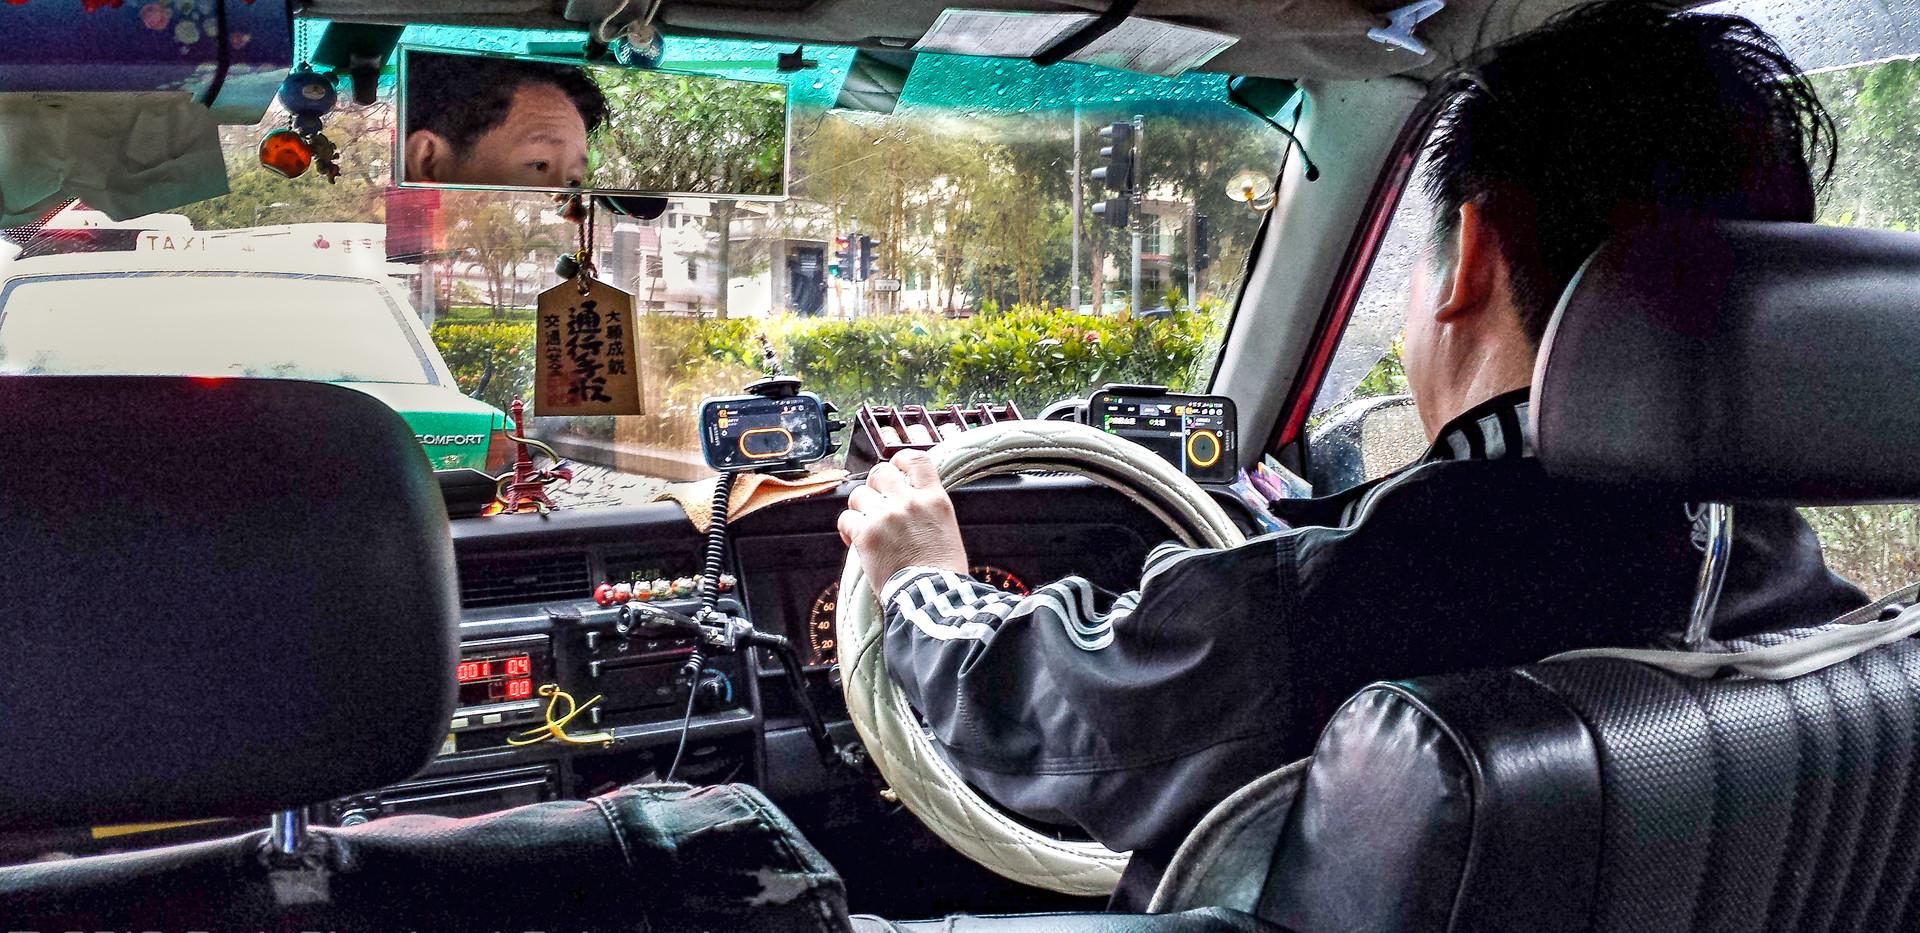 New Territories taxi cab